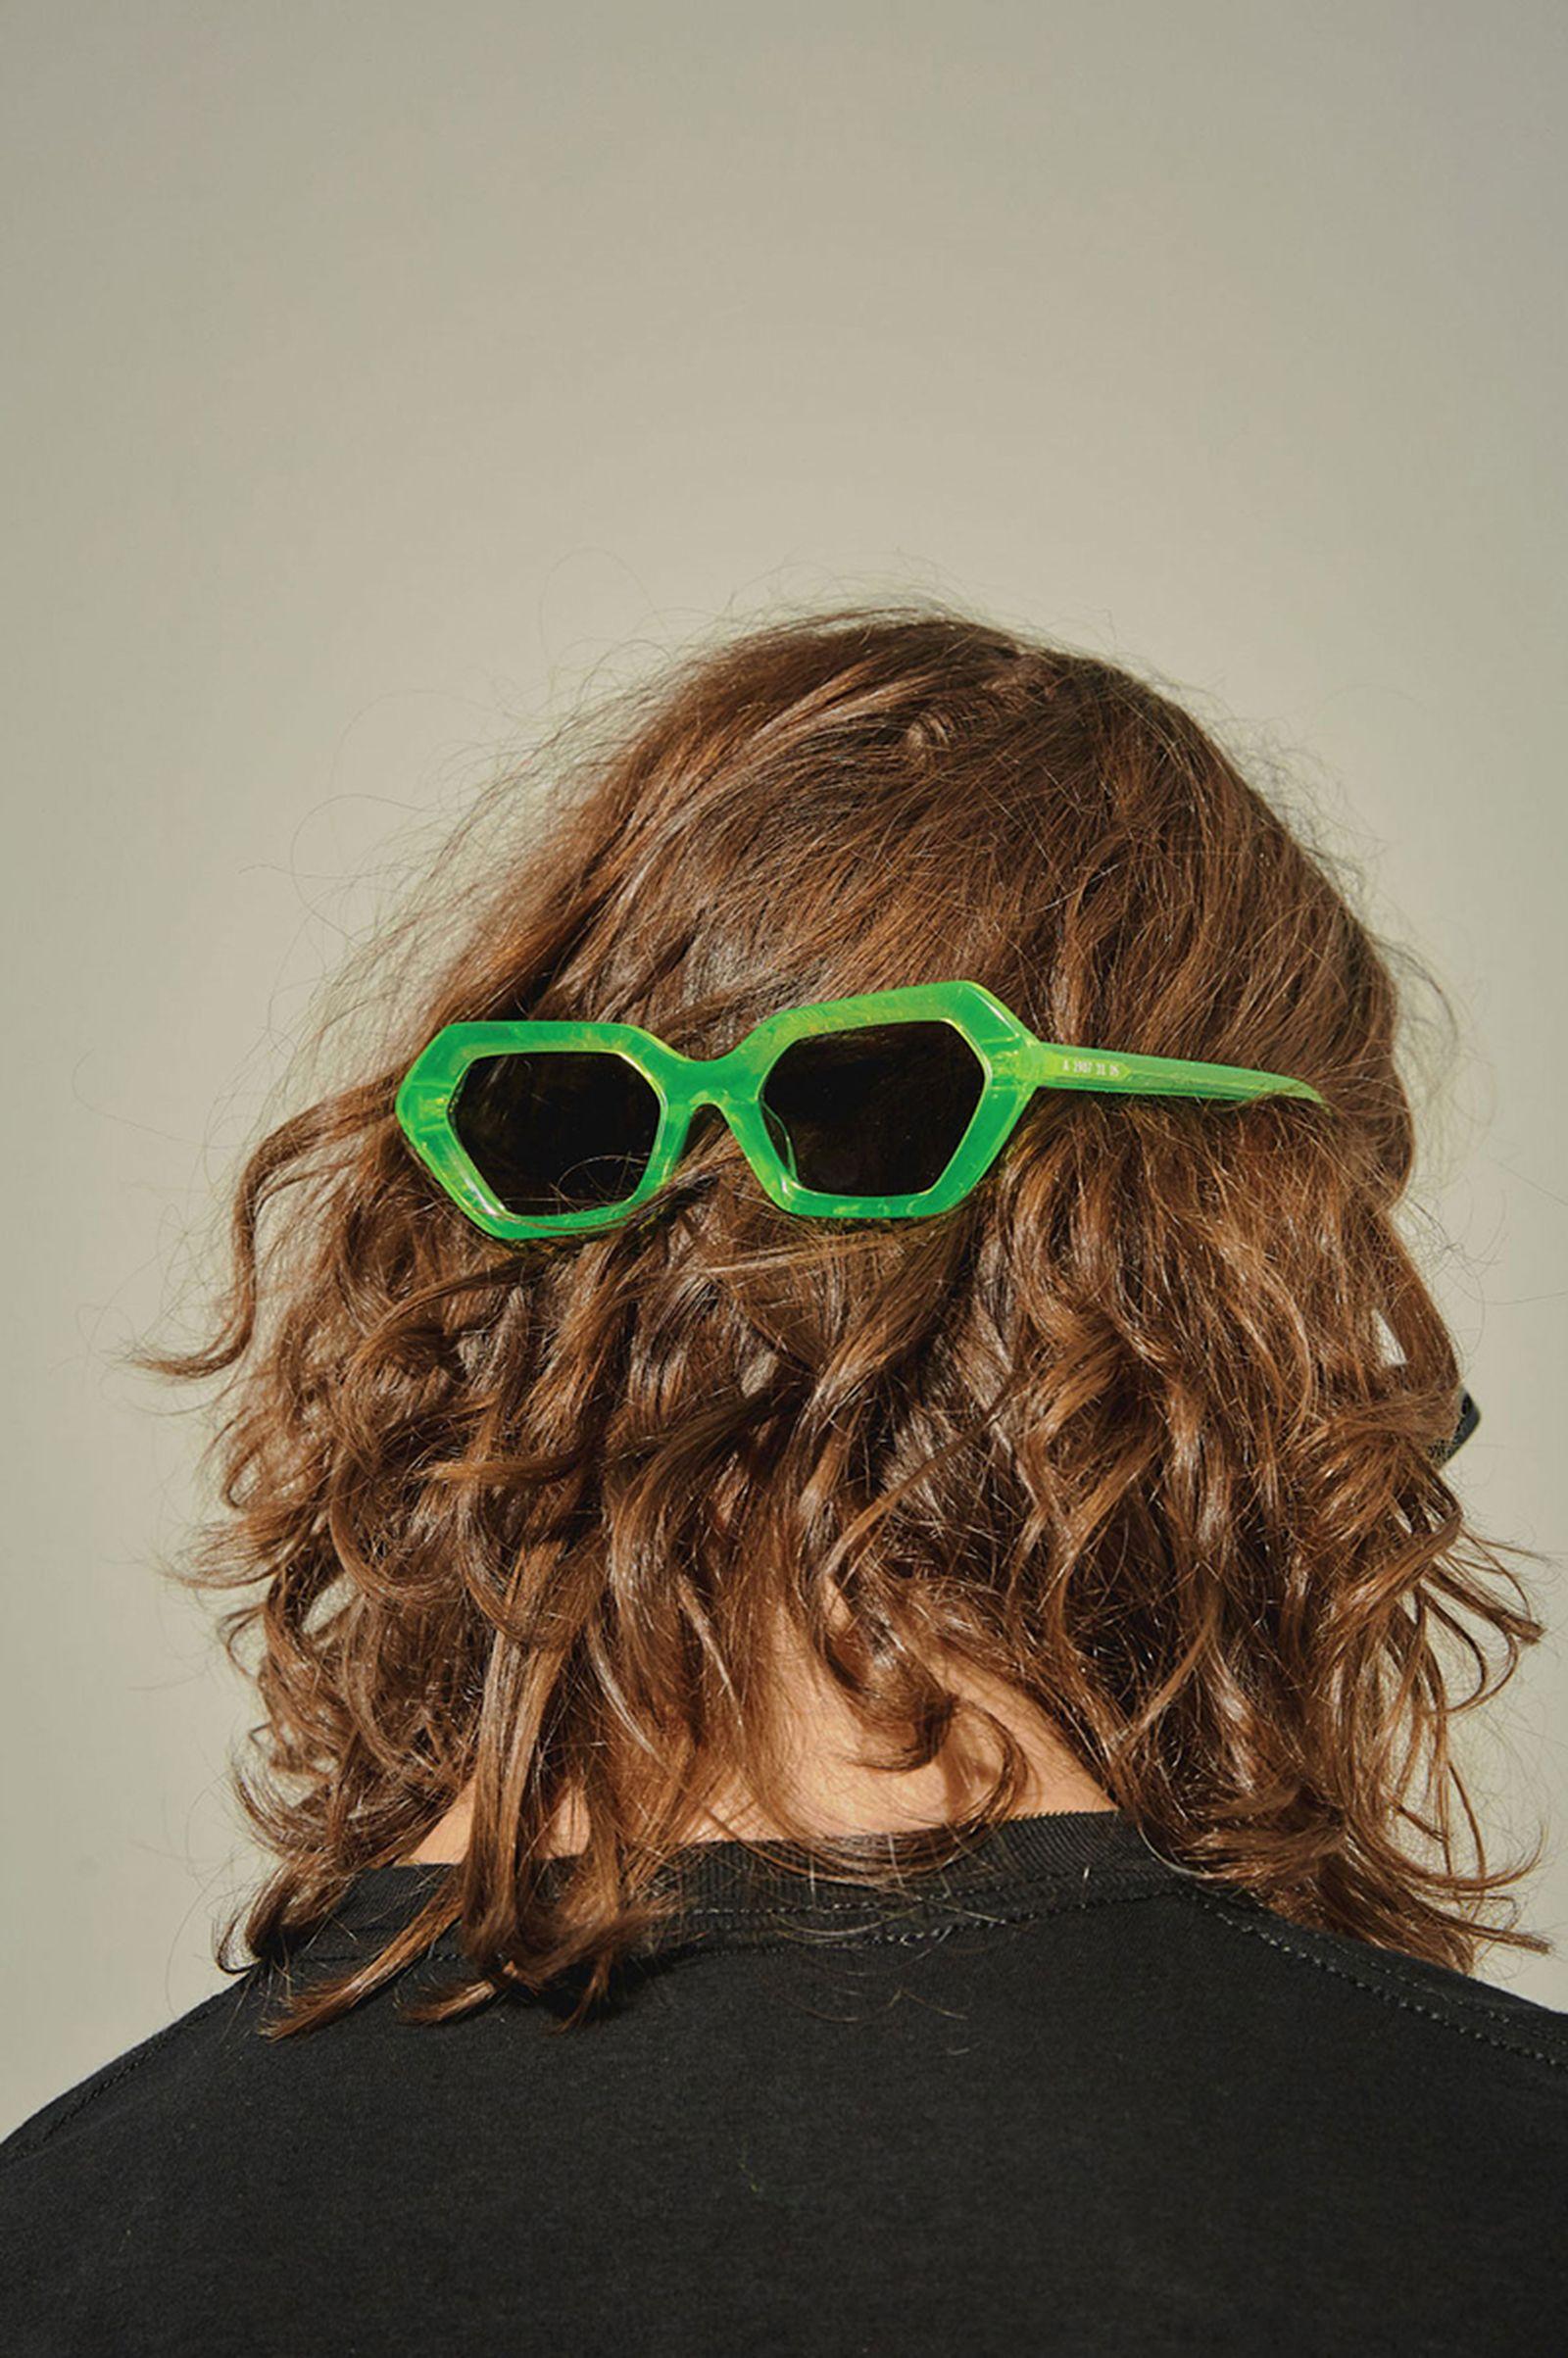 10 deep akila sunglasses